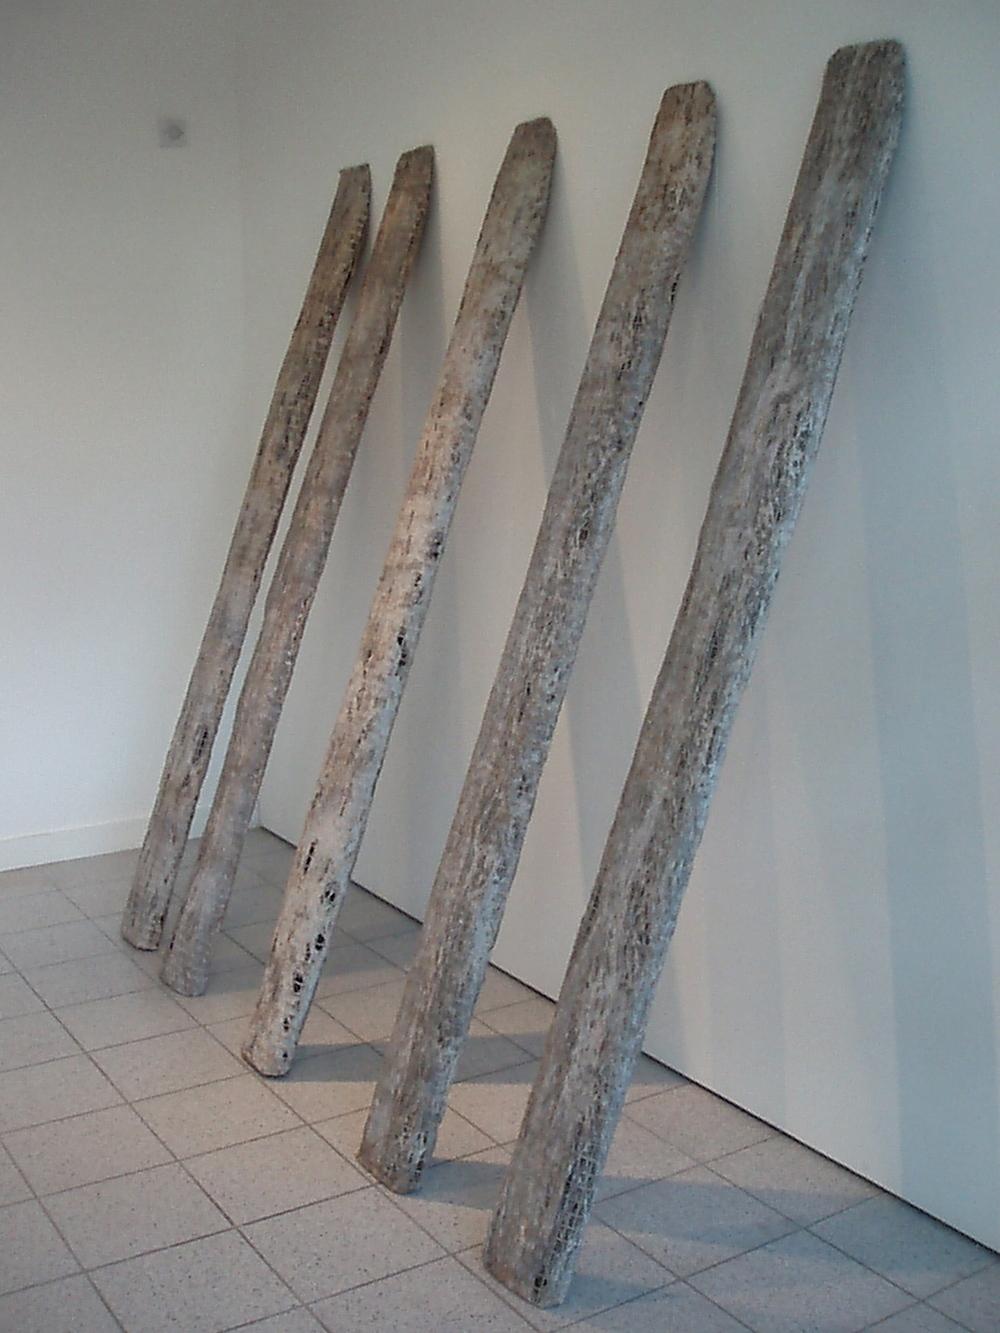 Still Standing - Dimensions: 200 x 120 x 50 cm